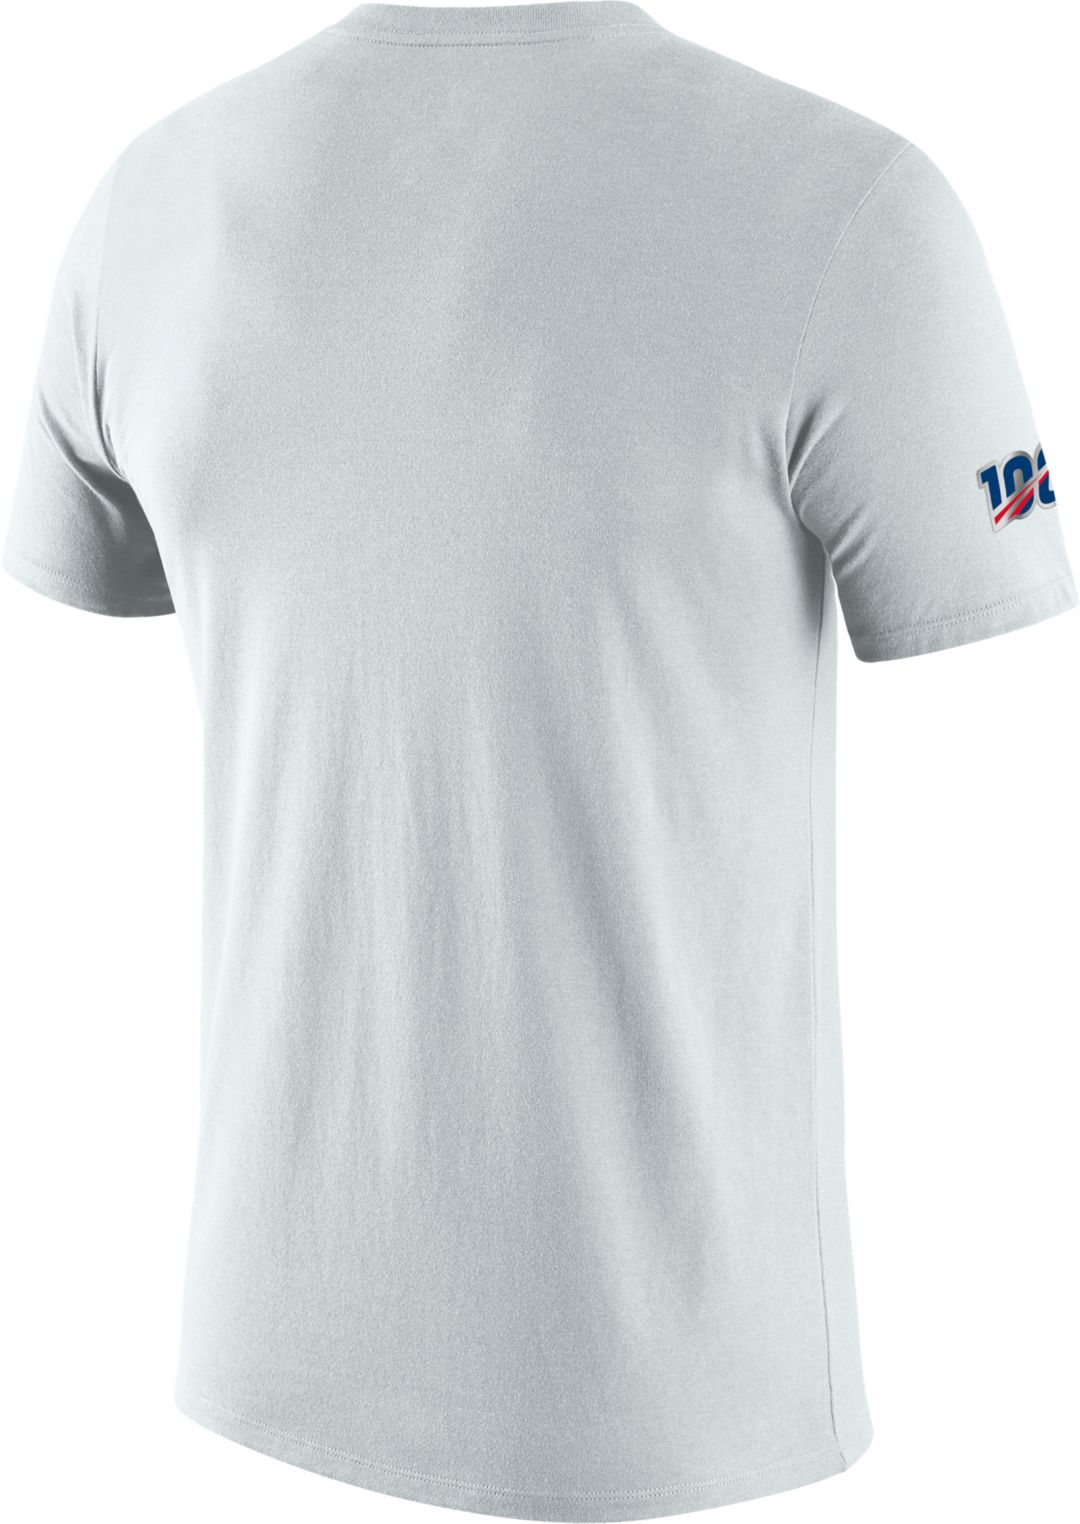 3a436319 Nike Men's Atlanta Falcons 100th Sideline Legend Performance White T-Shirt